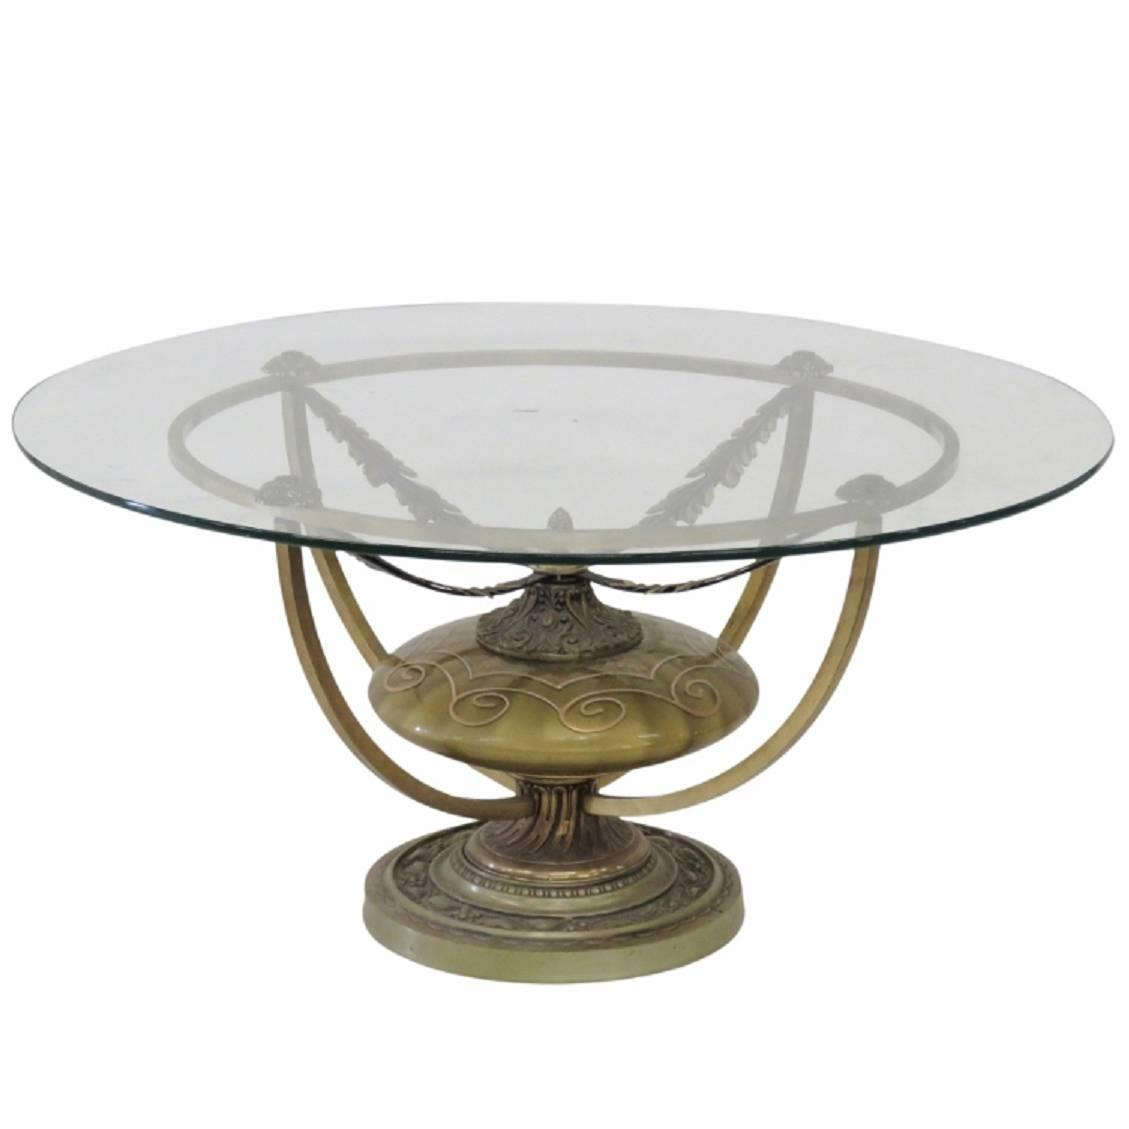 Mid Century Modern Round Coffee Tables: Mid-Century Modern Round Urn Base Glass Top Coffee Table